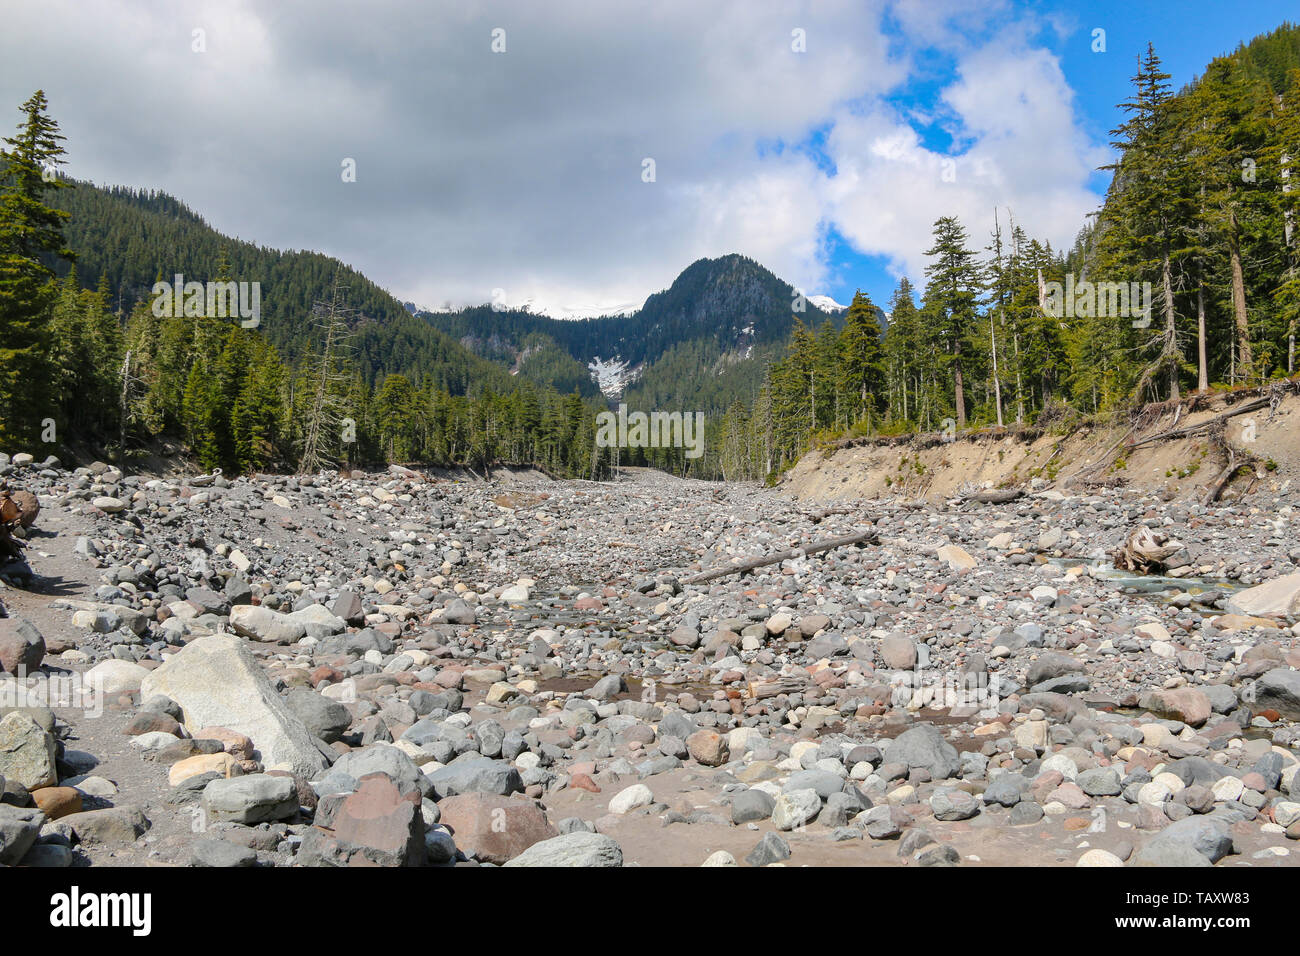 Paradise River, Mount Rainier National Park - Stock Image